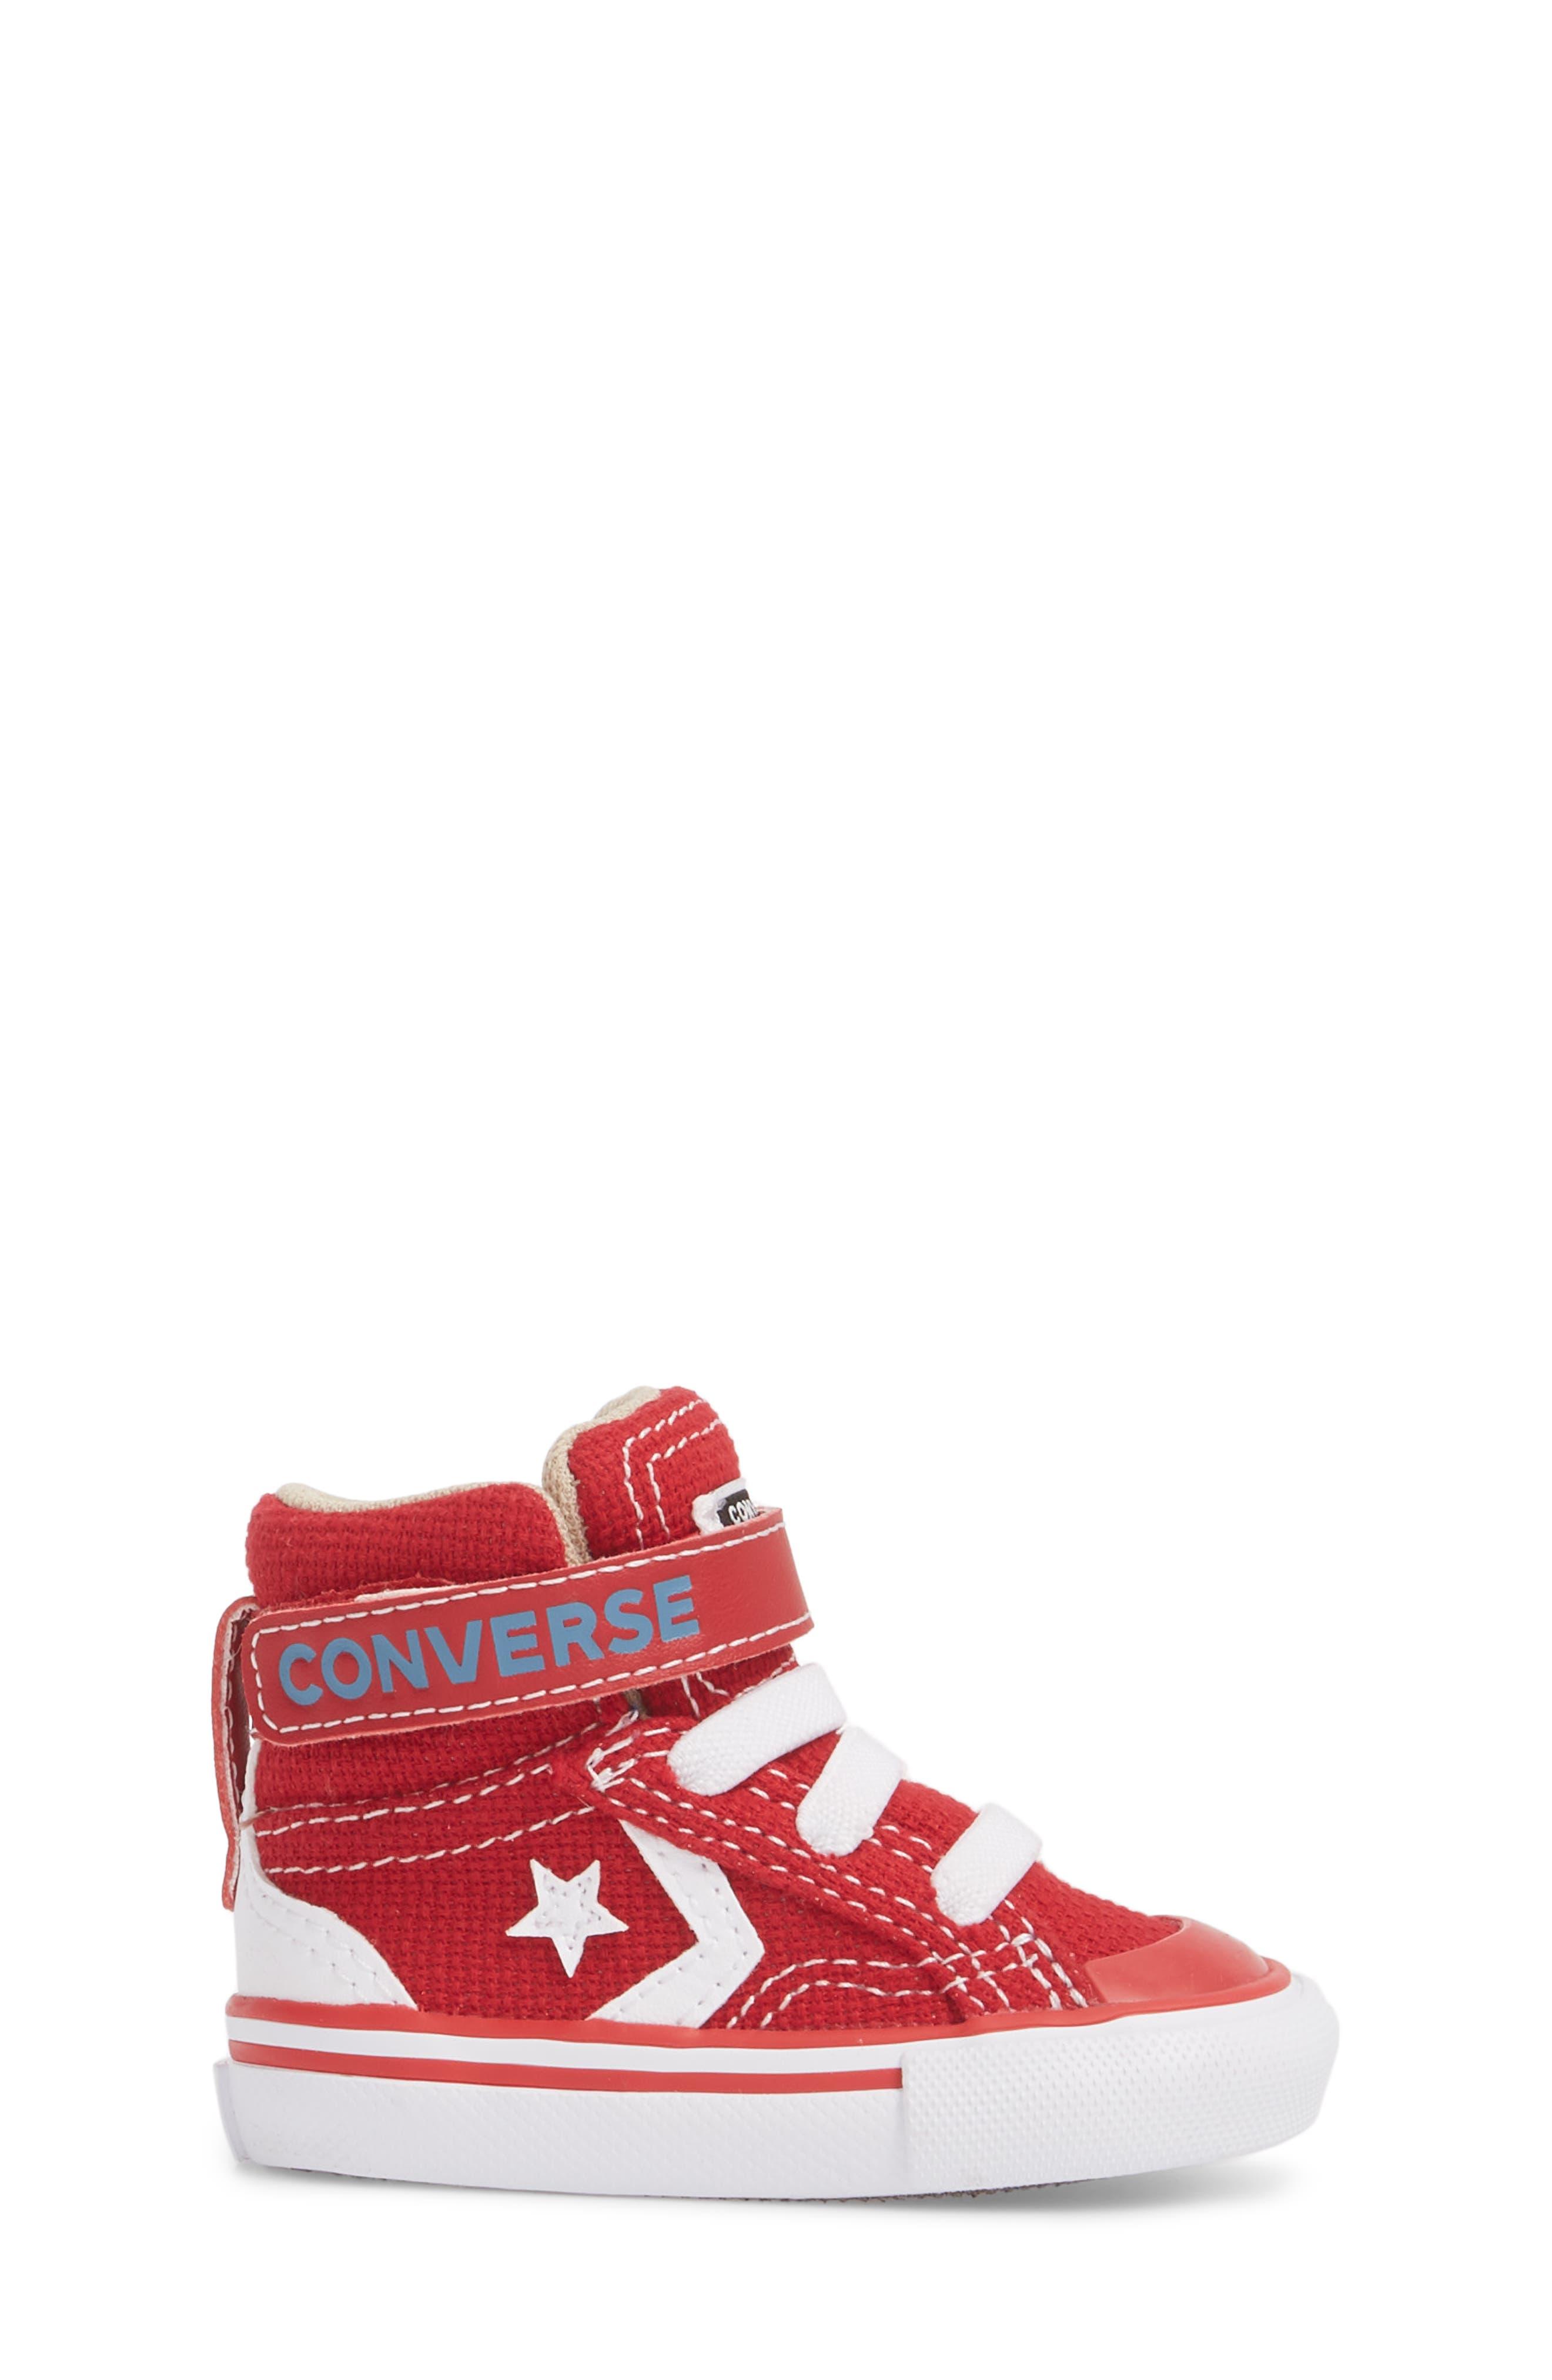 Pro Blaze High Top Sneaker,                             Alternate thumbnail 3, color,                             Gym Red